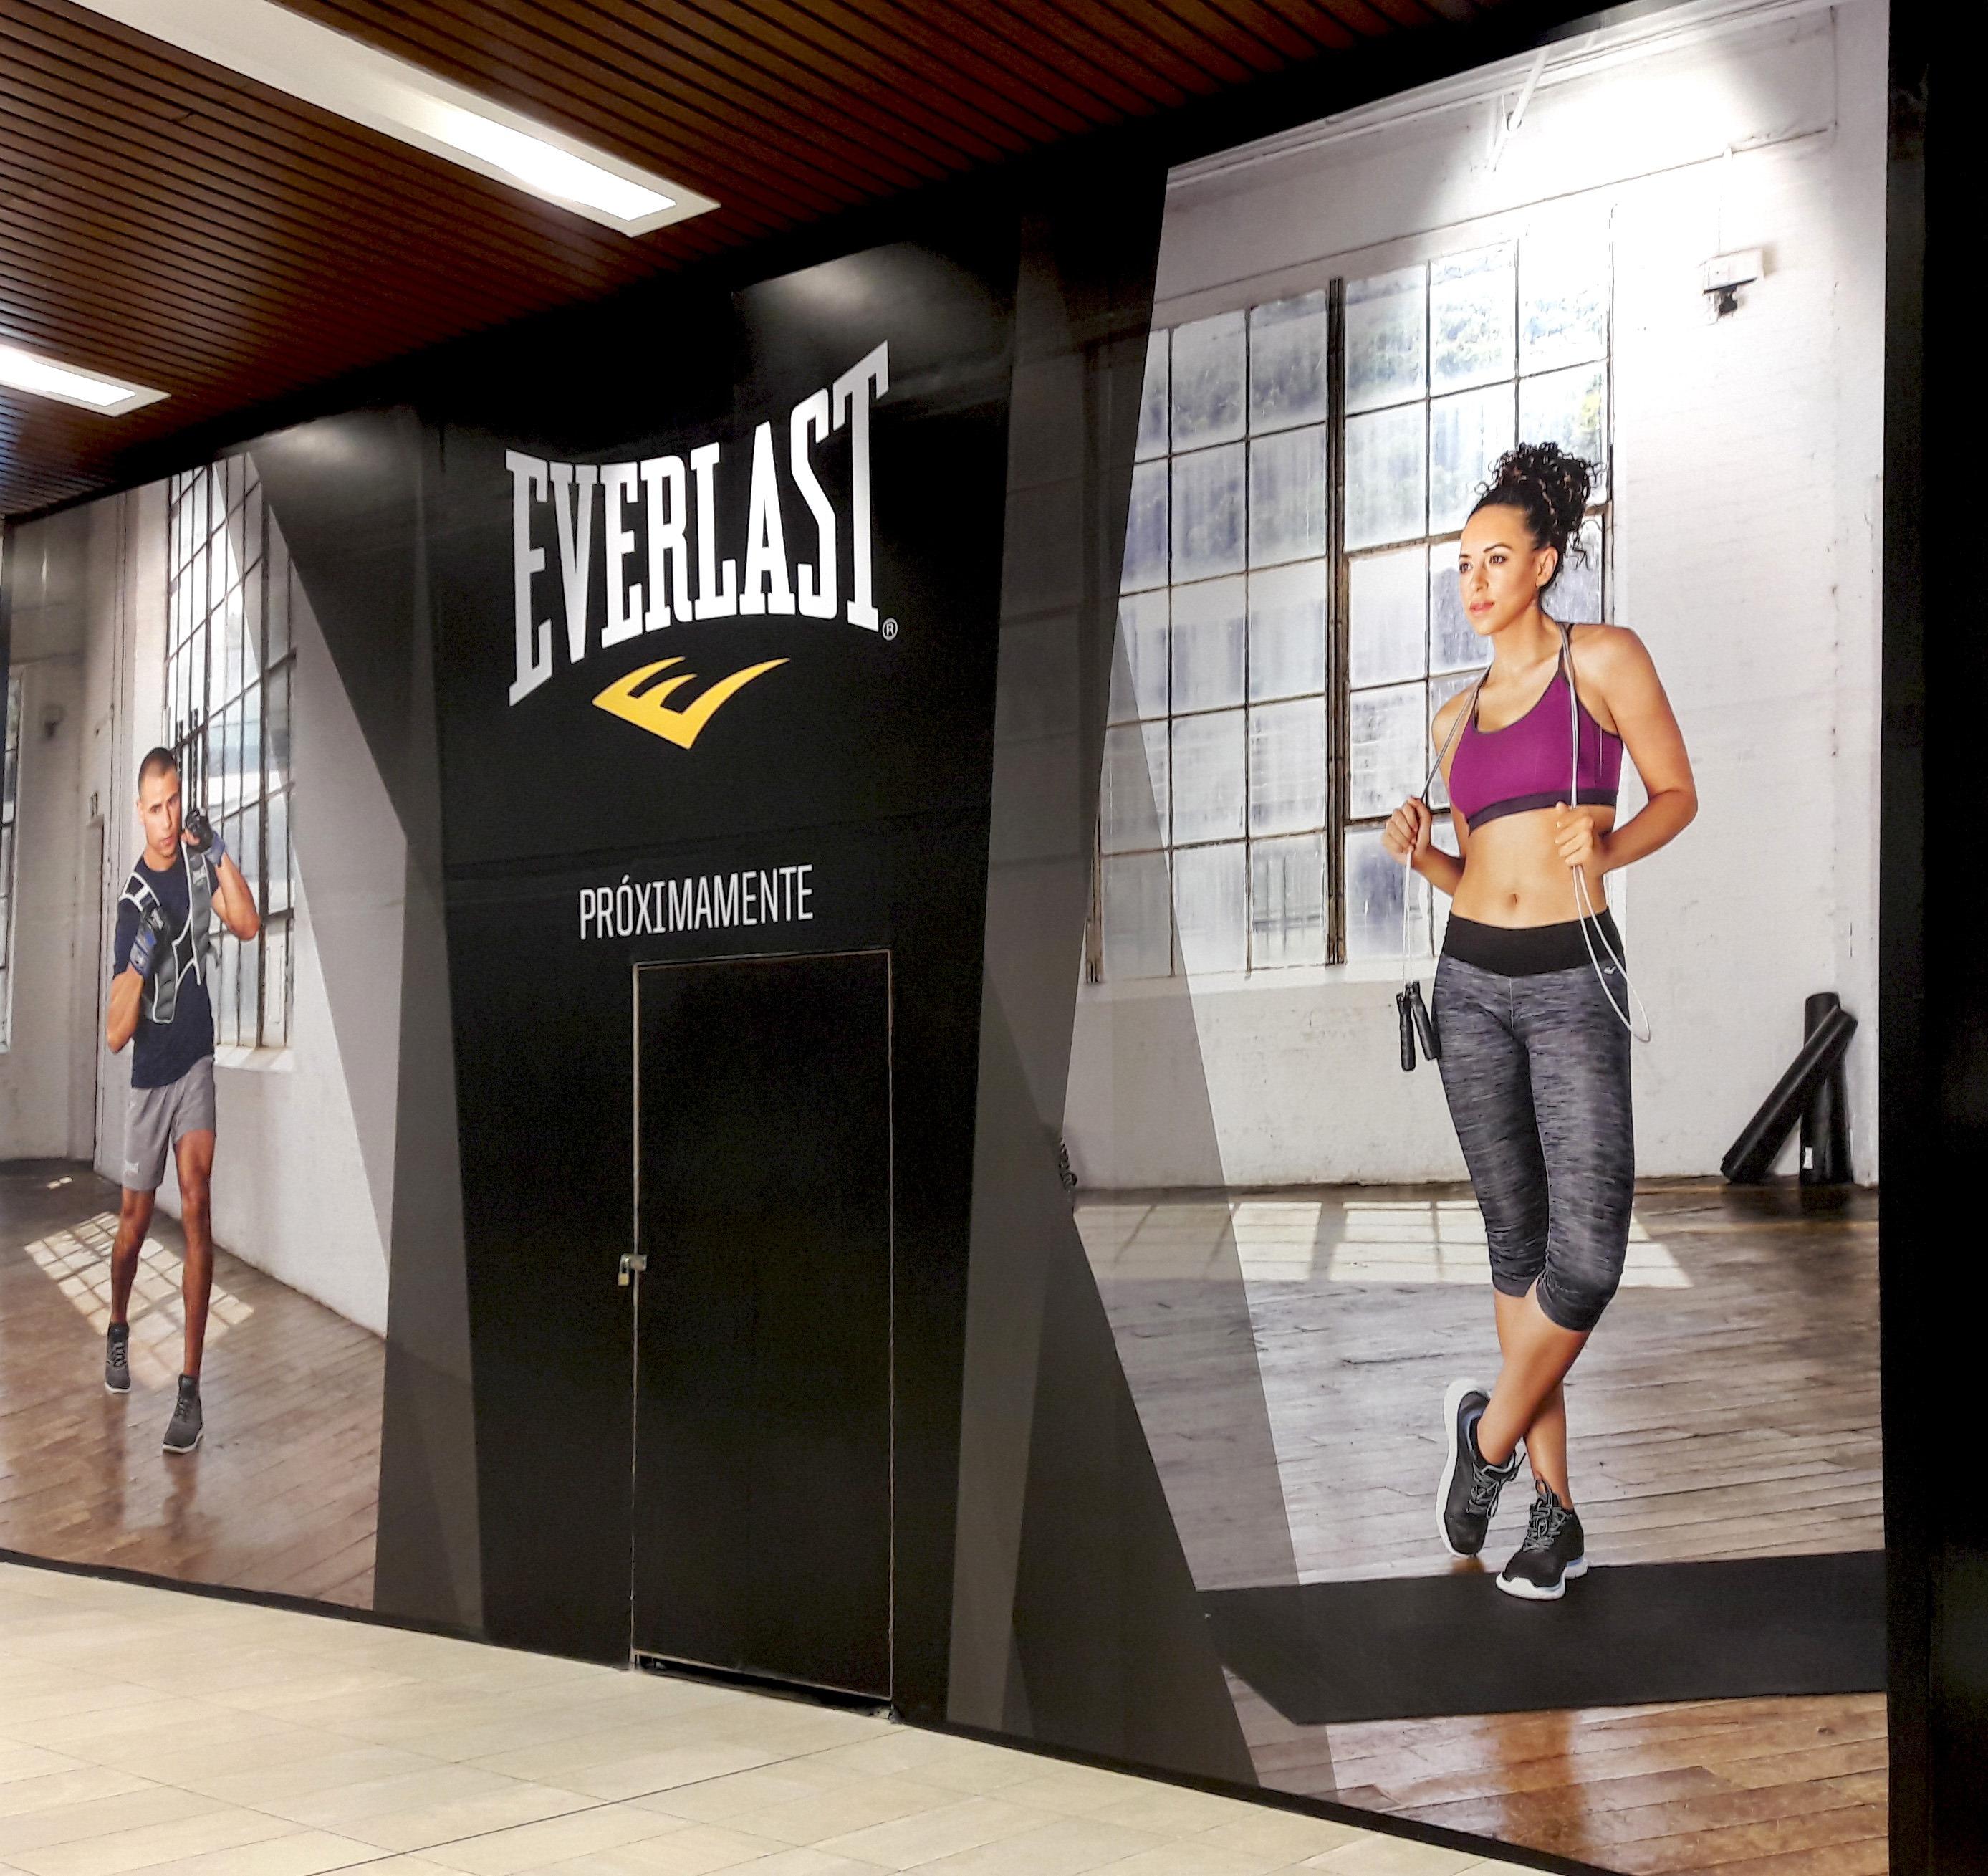 everlast tienda 2 - Everlast invierte US$ 180 mil dólares en local del Jockey Plaza